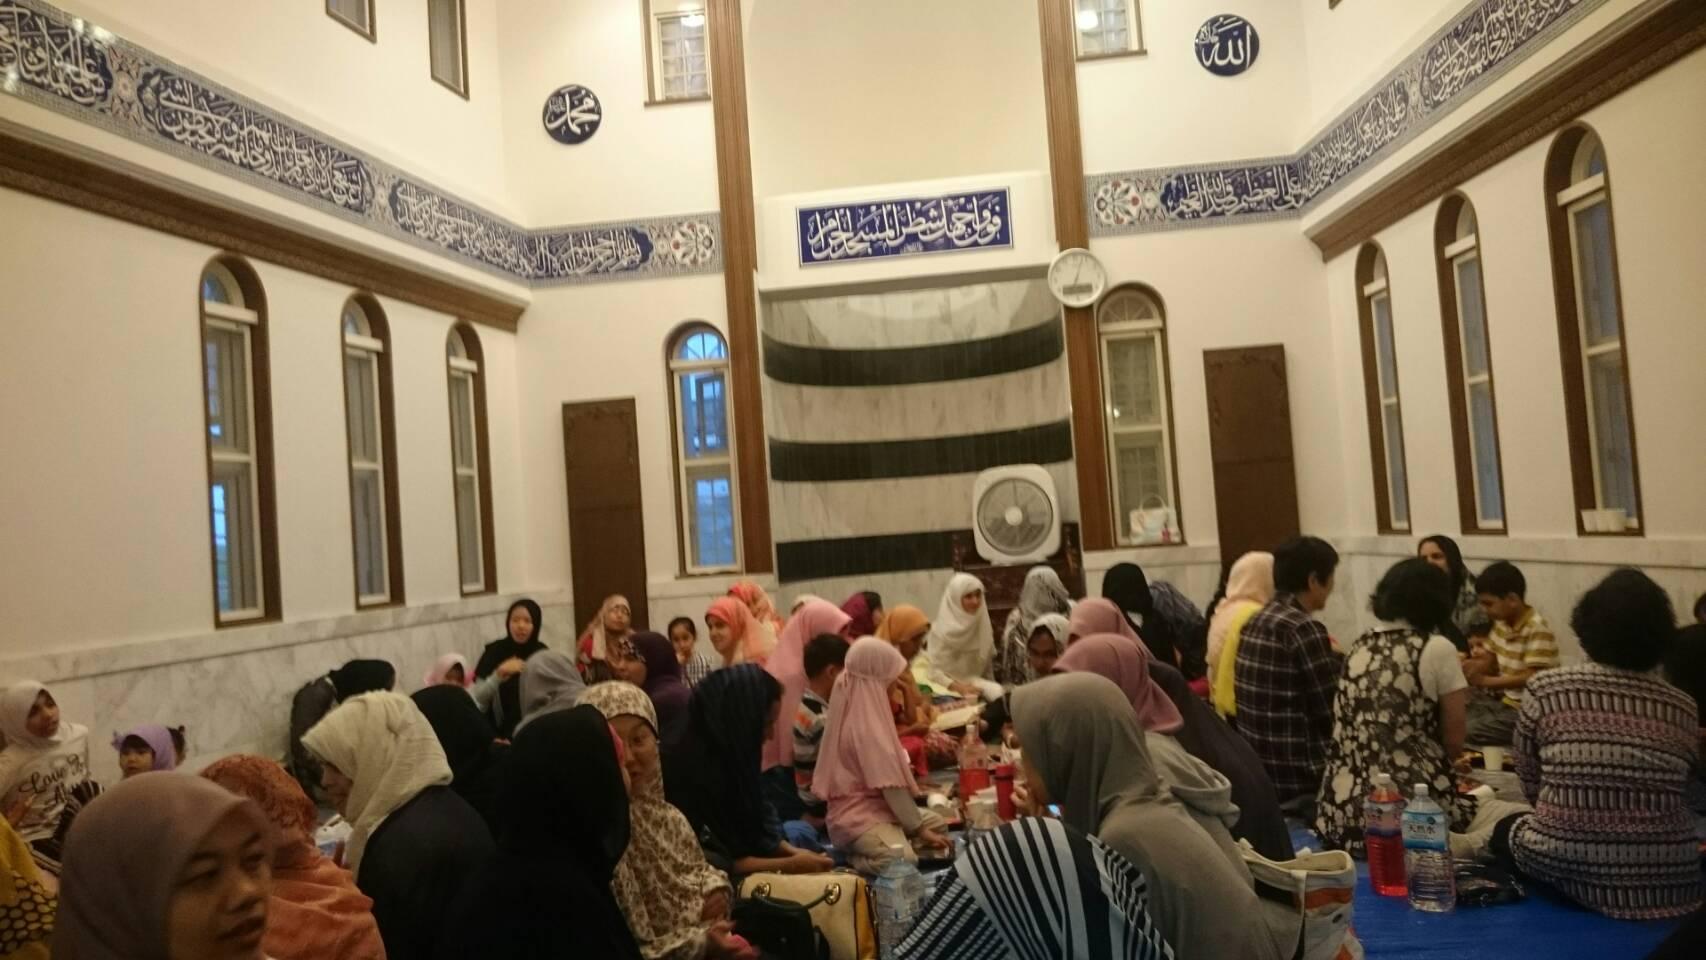 https: img.okeinfo.net content 2017 06 21 18 1721978 komunitas-muslim-di-jepang-bernostalgia-kuliner-negara-asal-saat-buka-puasa-bareng-PWGXJaVFZh.jpg